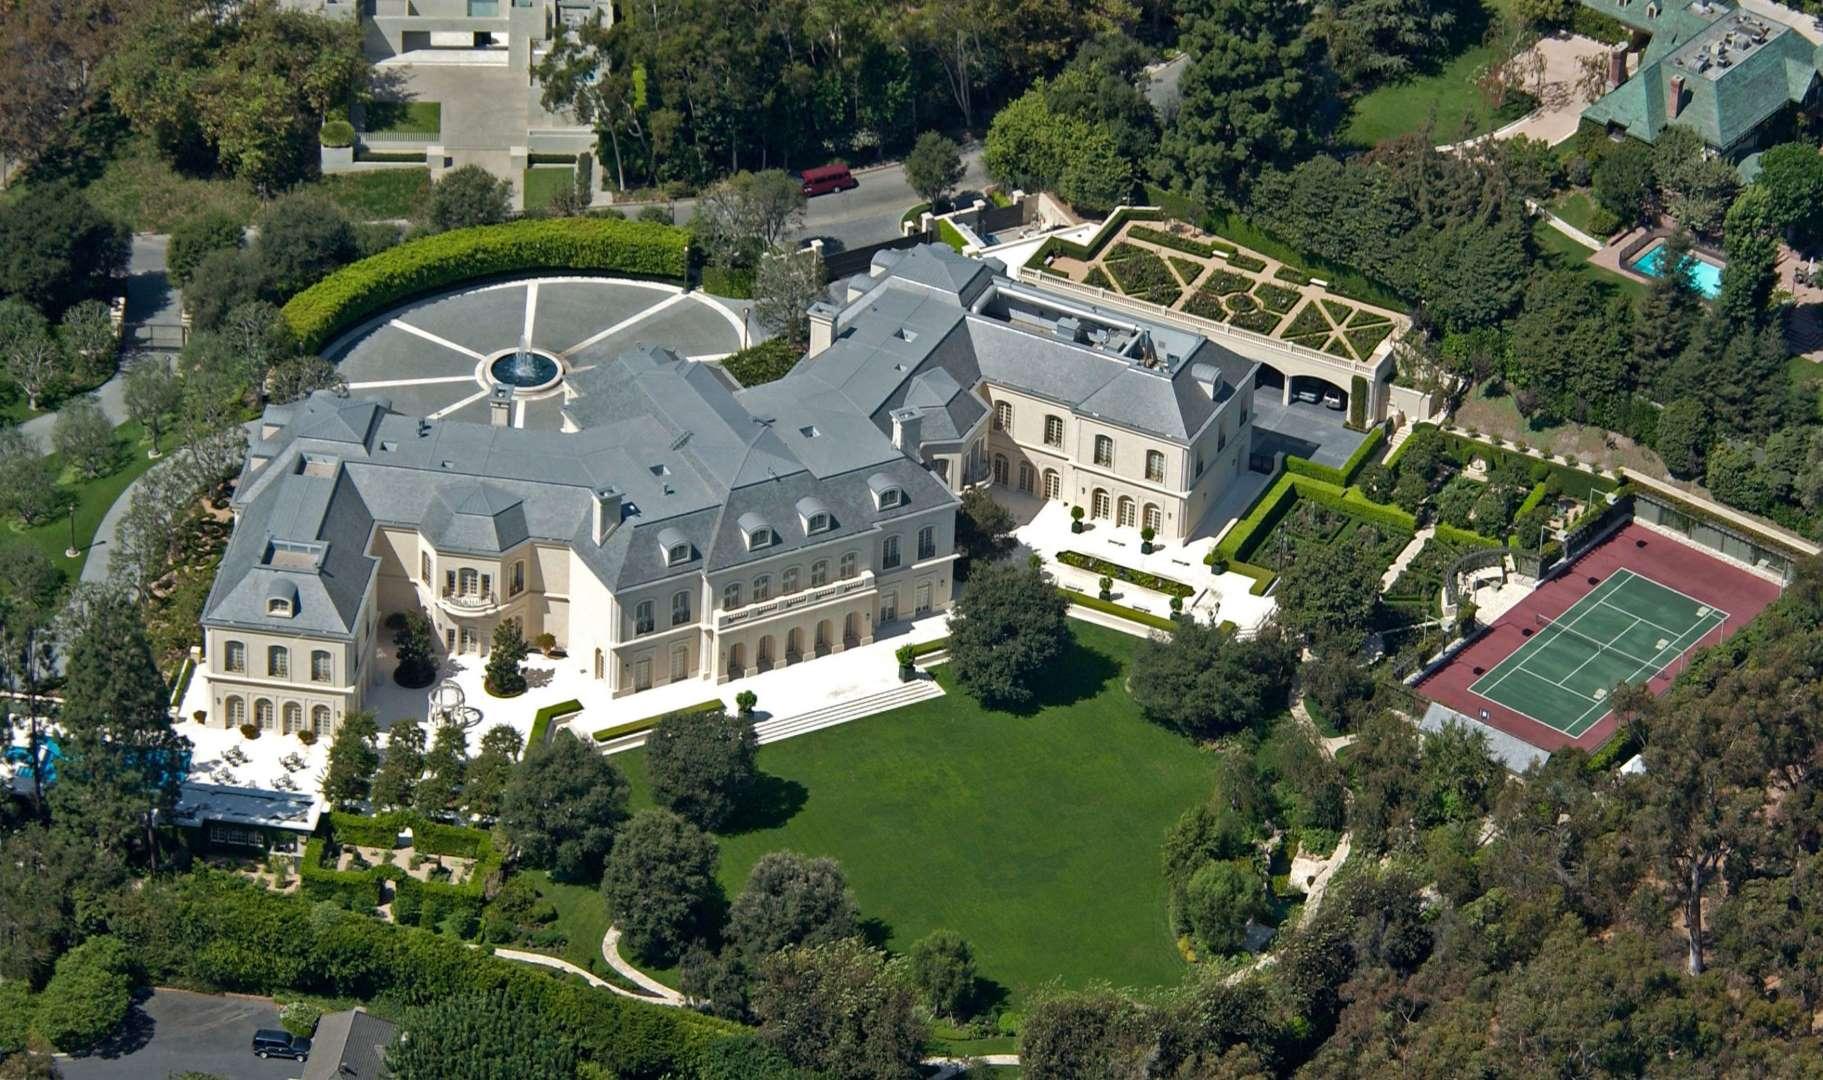 The-Spelling-Manor-–-Los-Angeles-California-USA.jpg